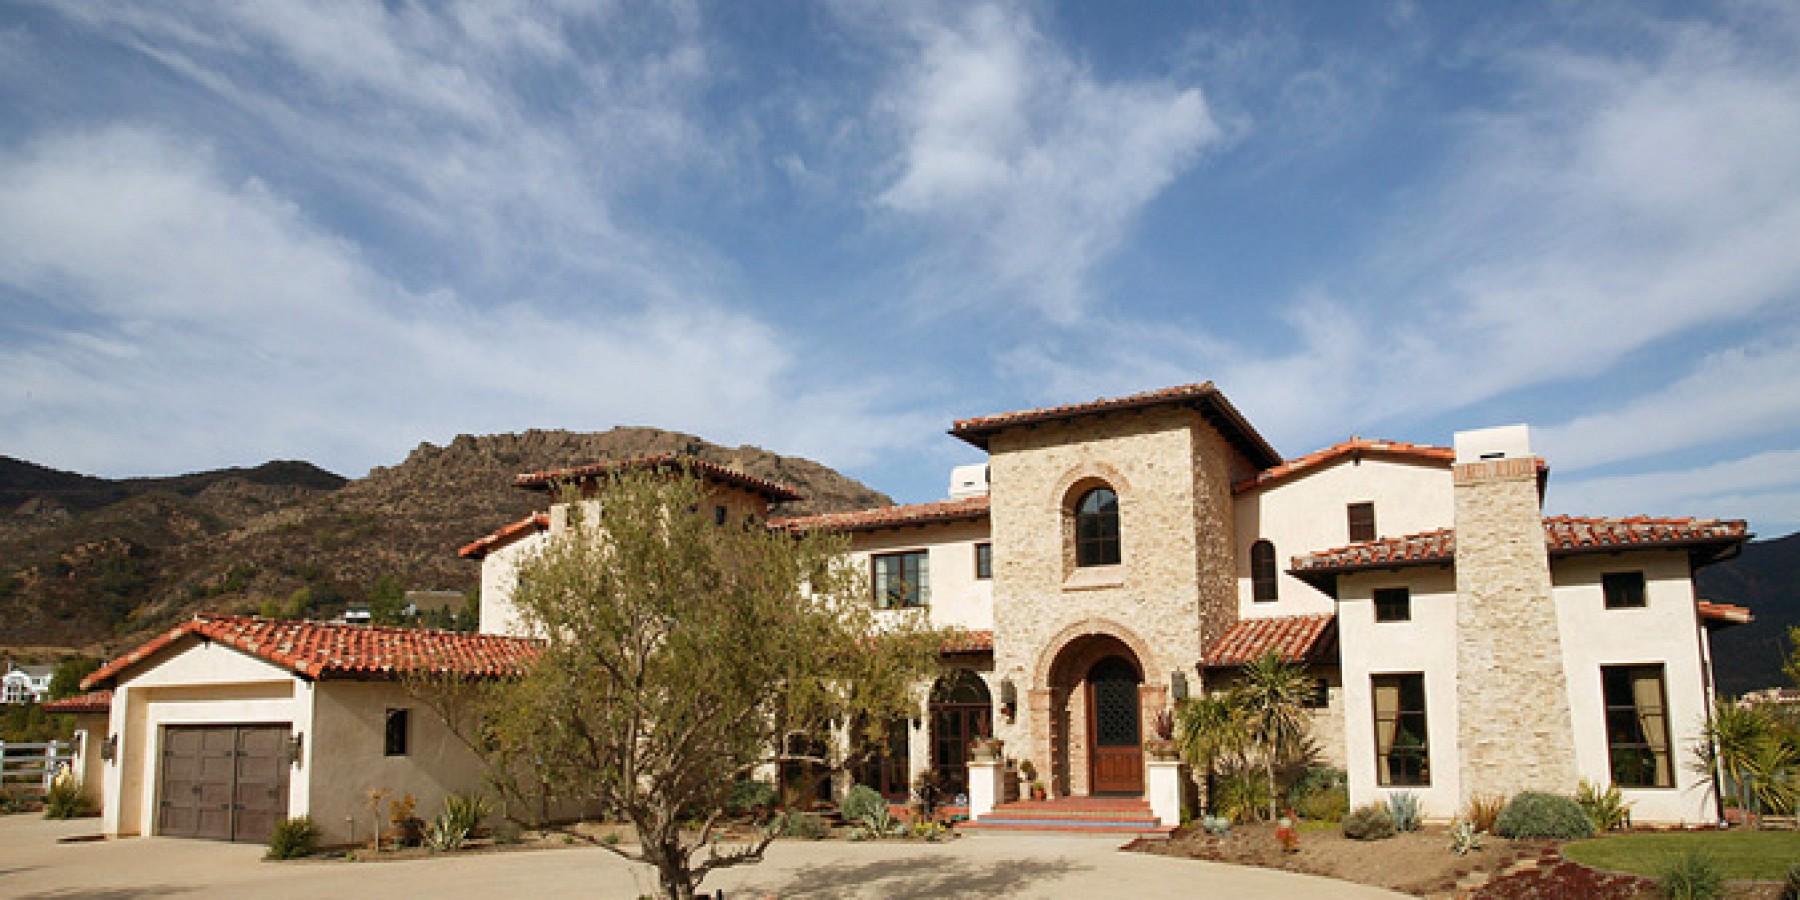 31182 Lobo Canyon Road, Agoura, CA 91301